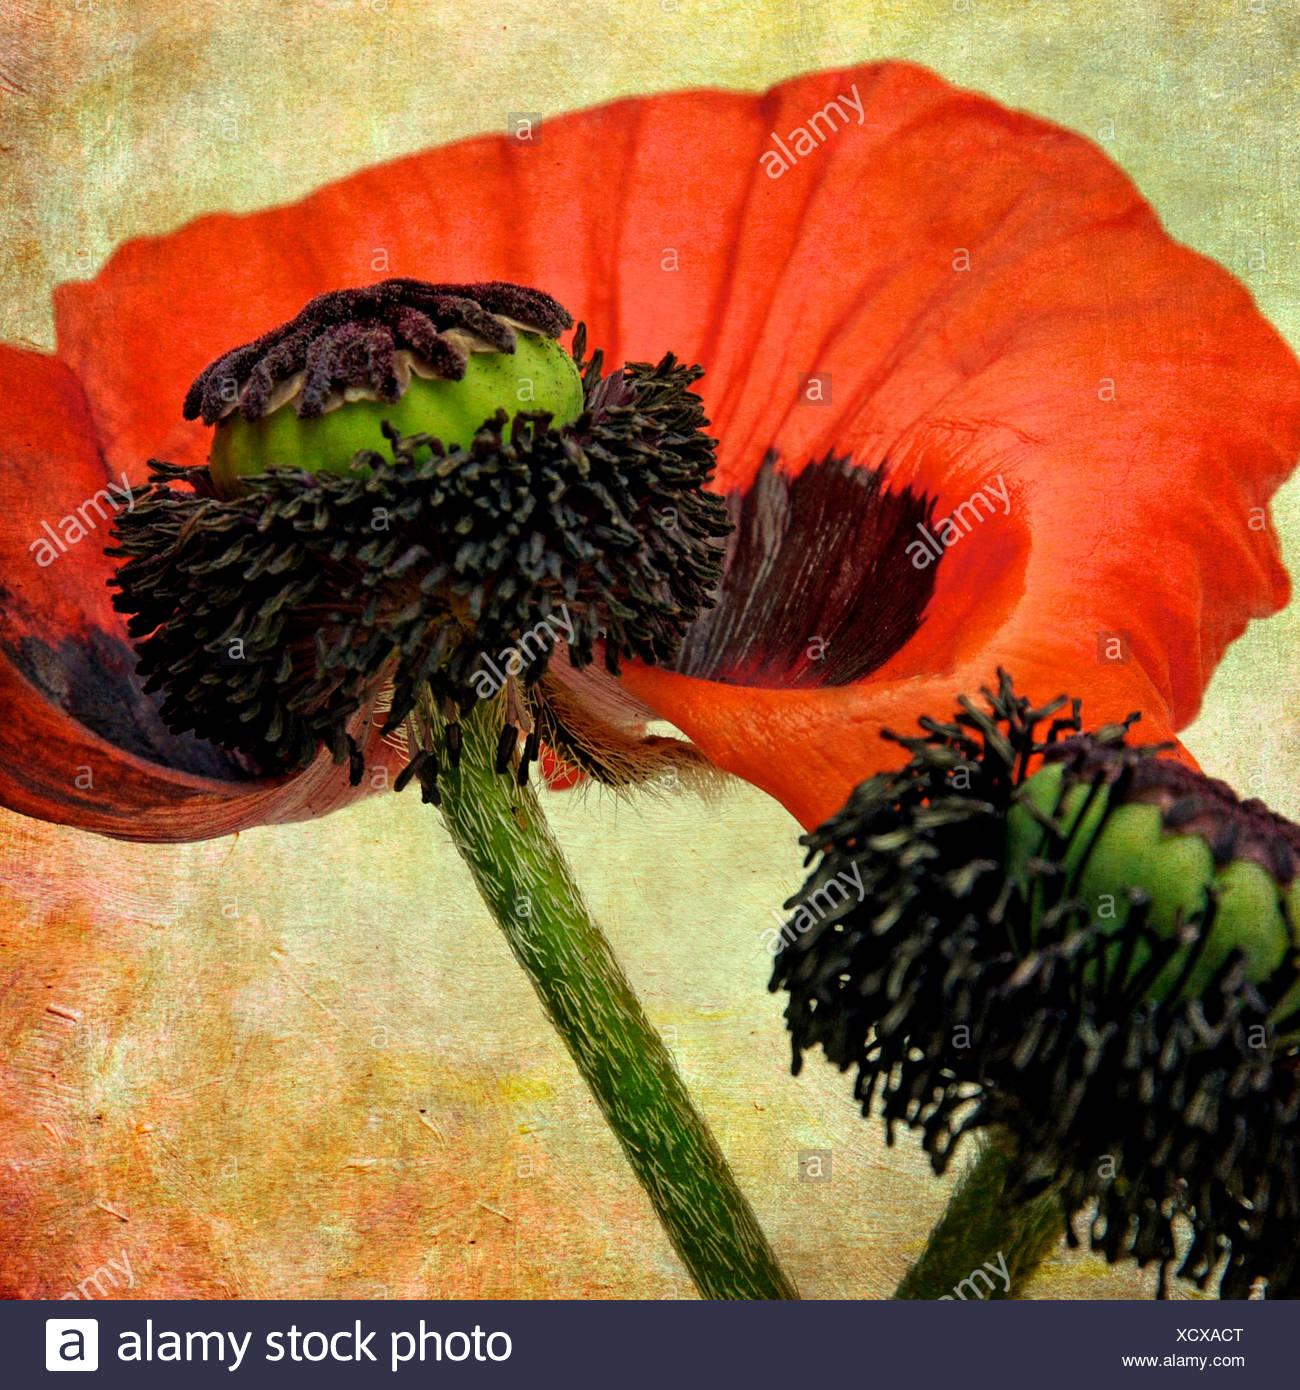 Dying Flowers Stockfotos & Dying Flowers Bilder - Alamy